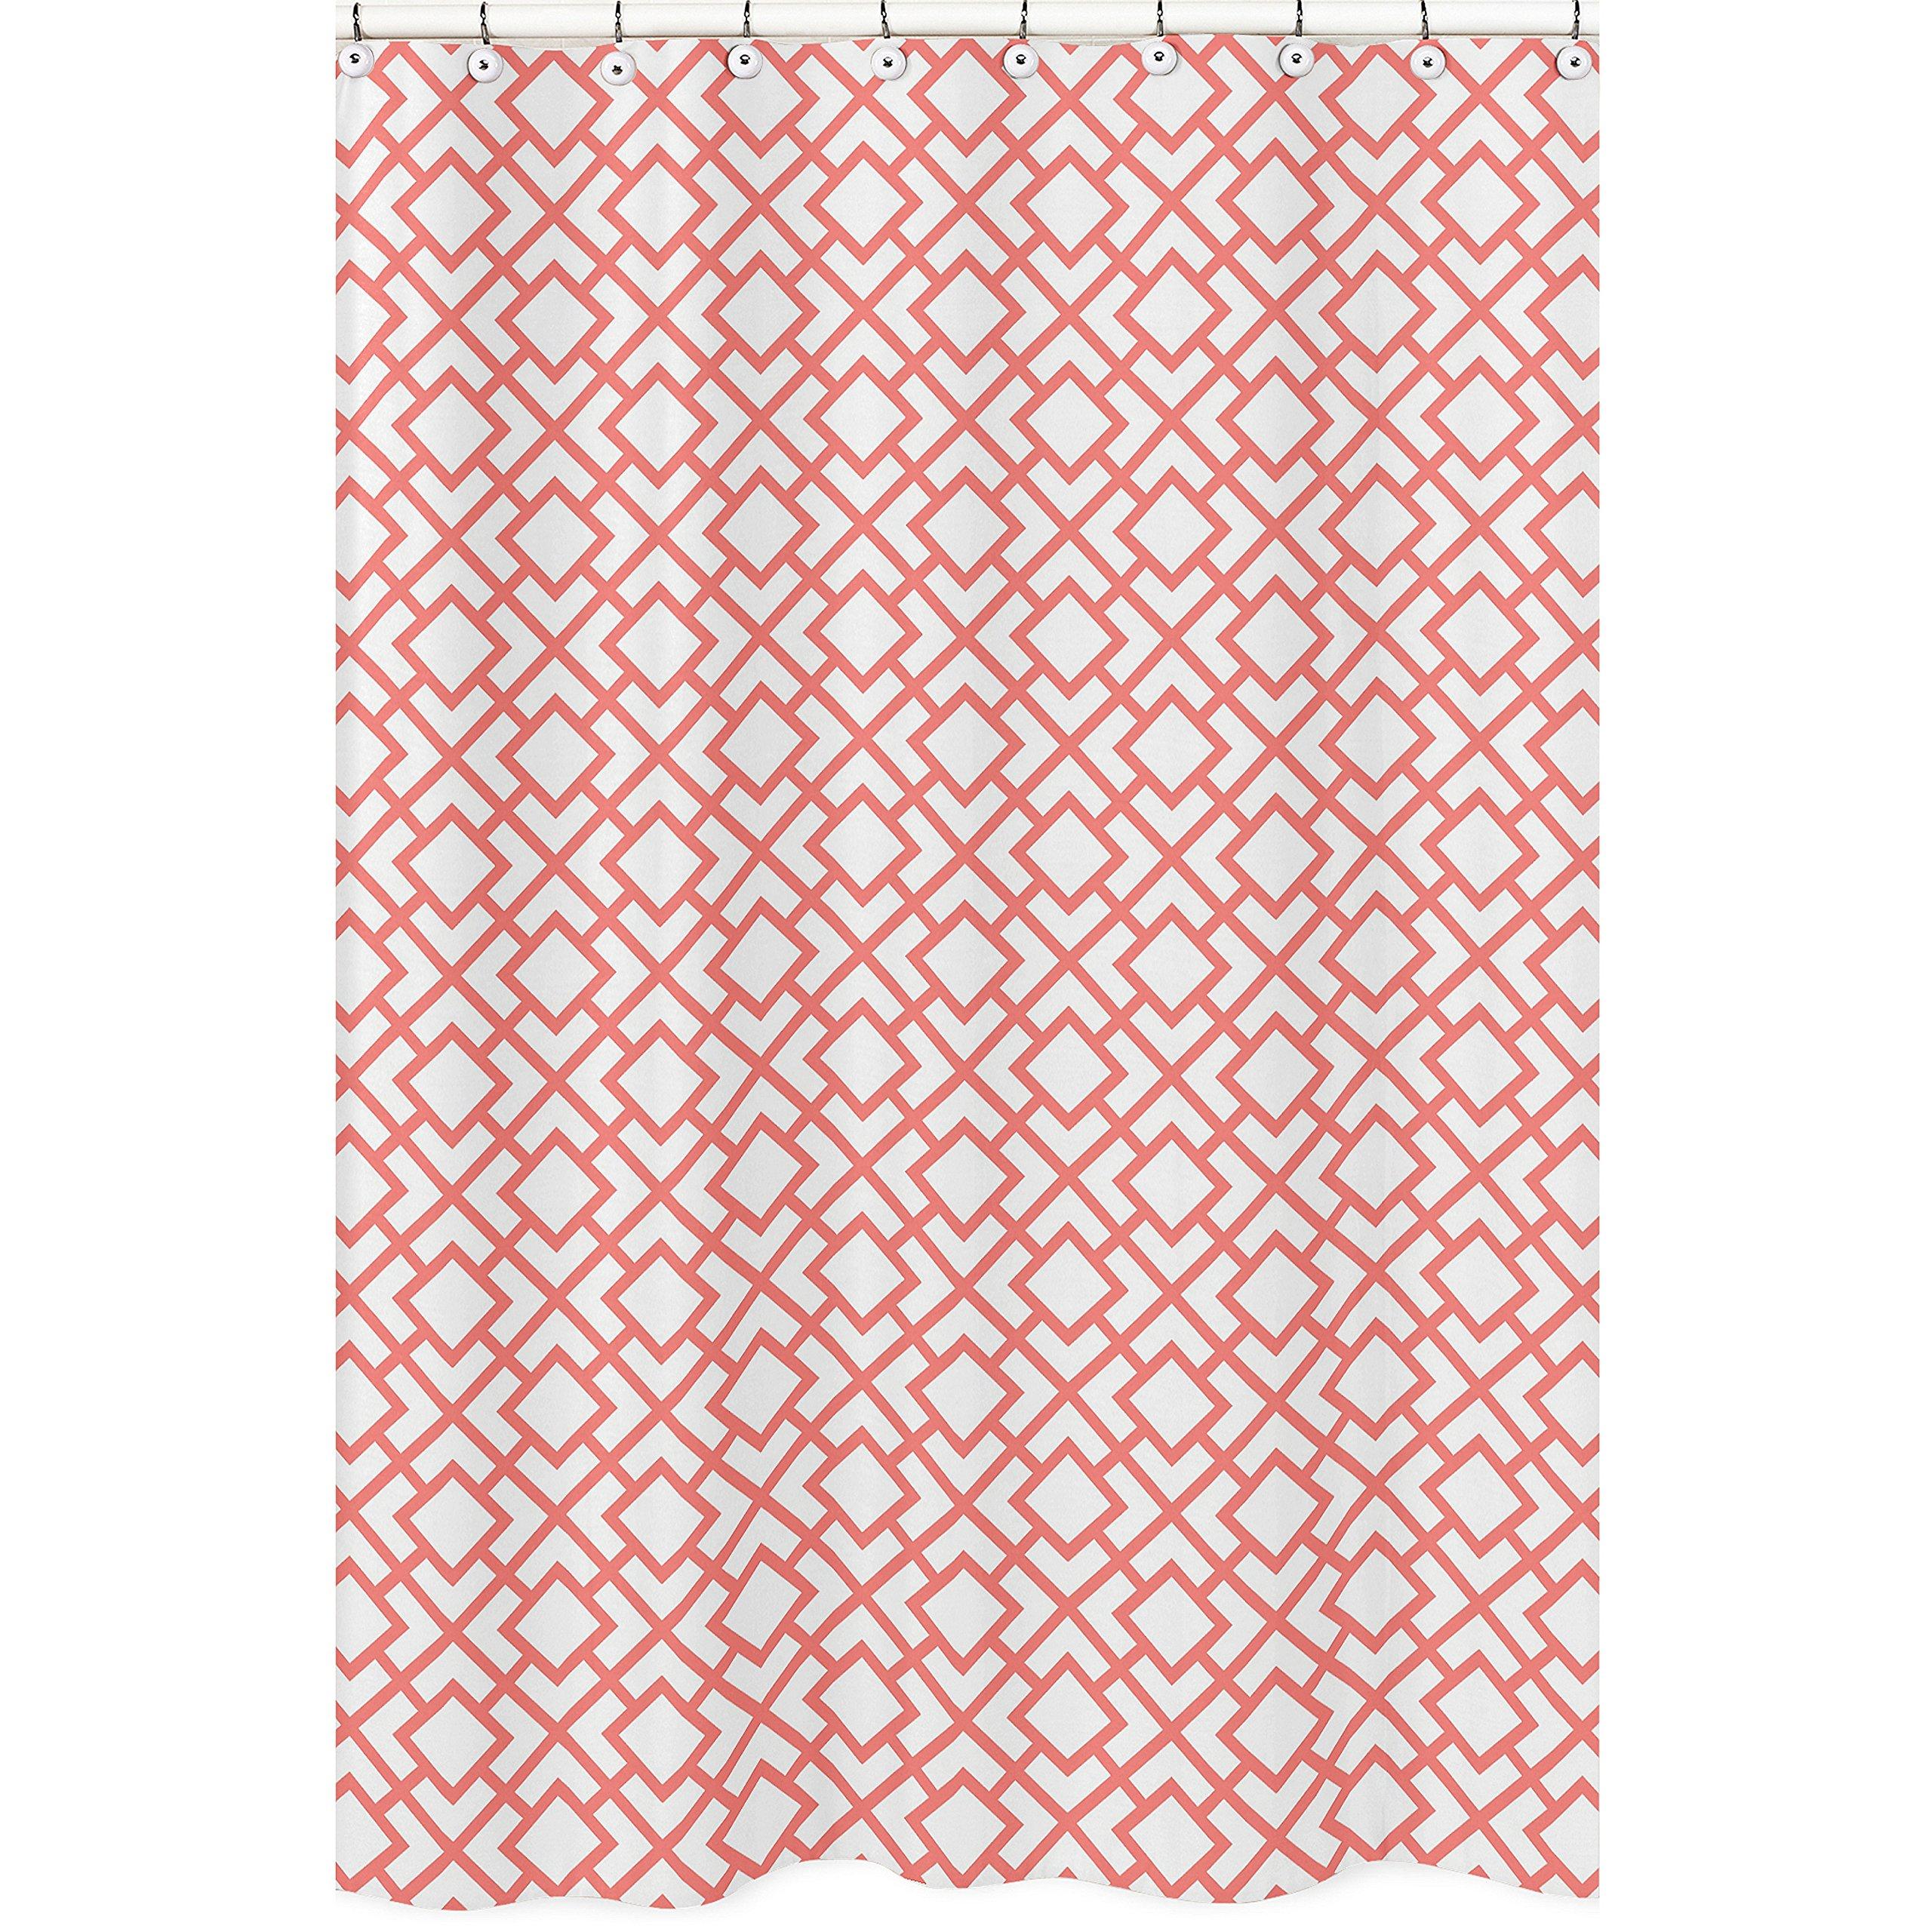 Sweet Jojo Designs Modern White and Coral Diamond Geometric Girls Kids Bathroom Fabric Bath Shower Curtain